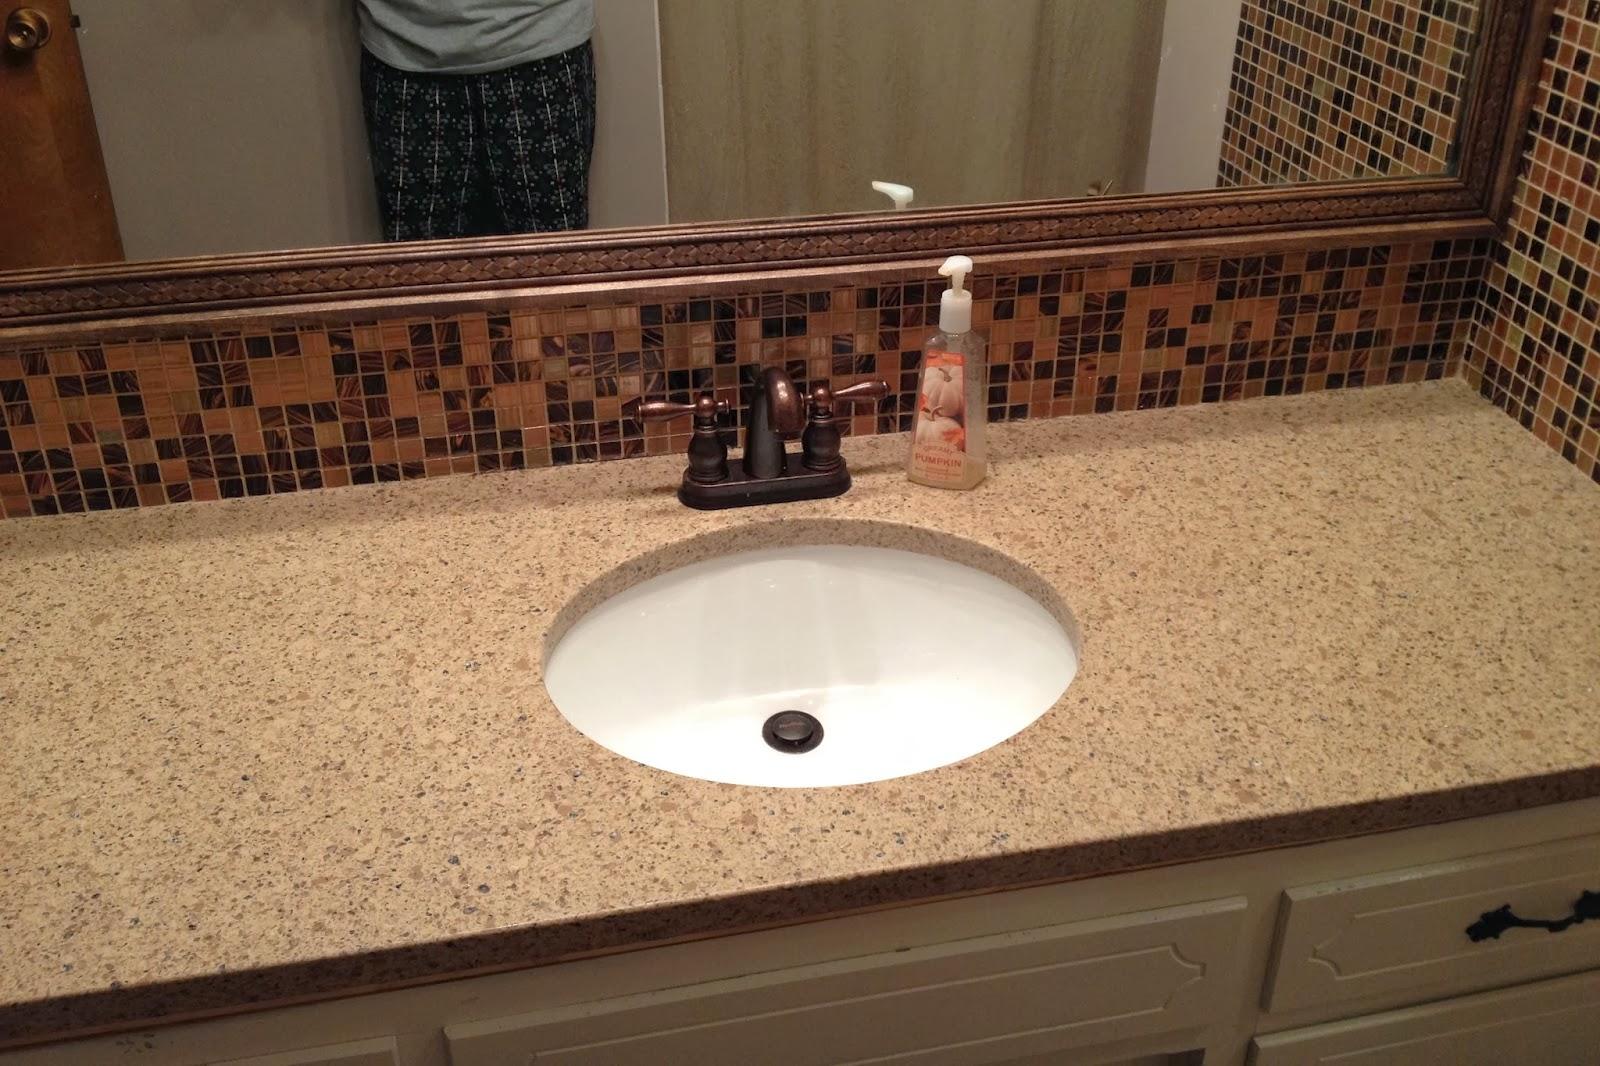 DIY Why Spend More: Decorative trim on bathroom mirror